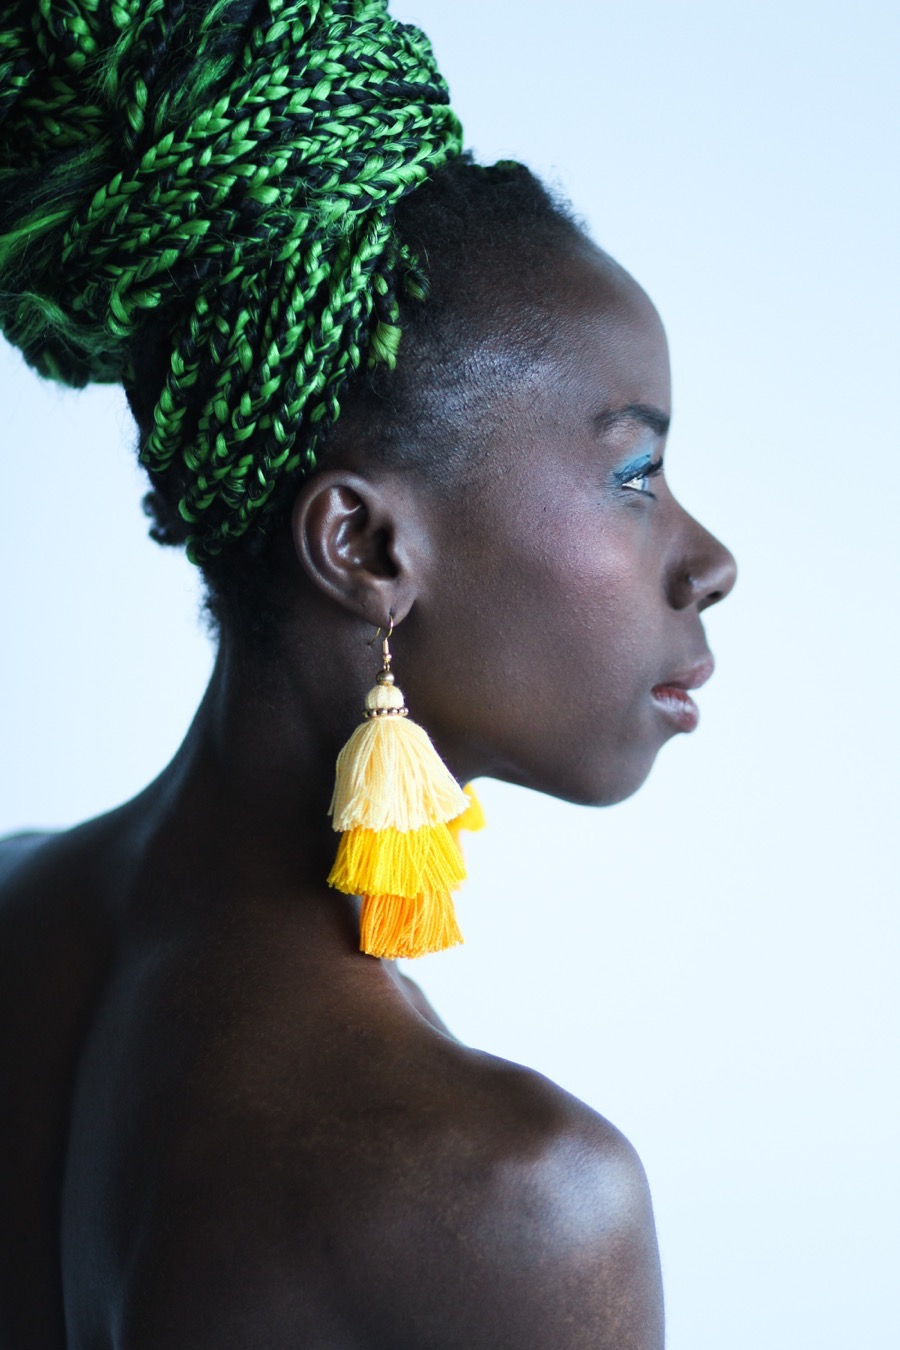 myrainbowtee-earrings-photo-marie-my-51